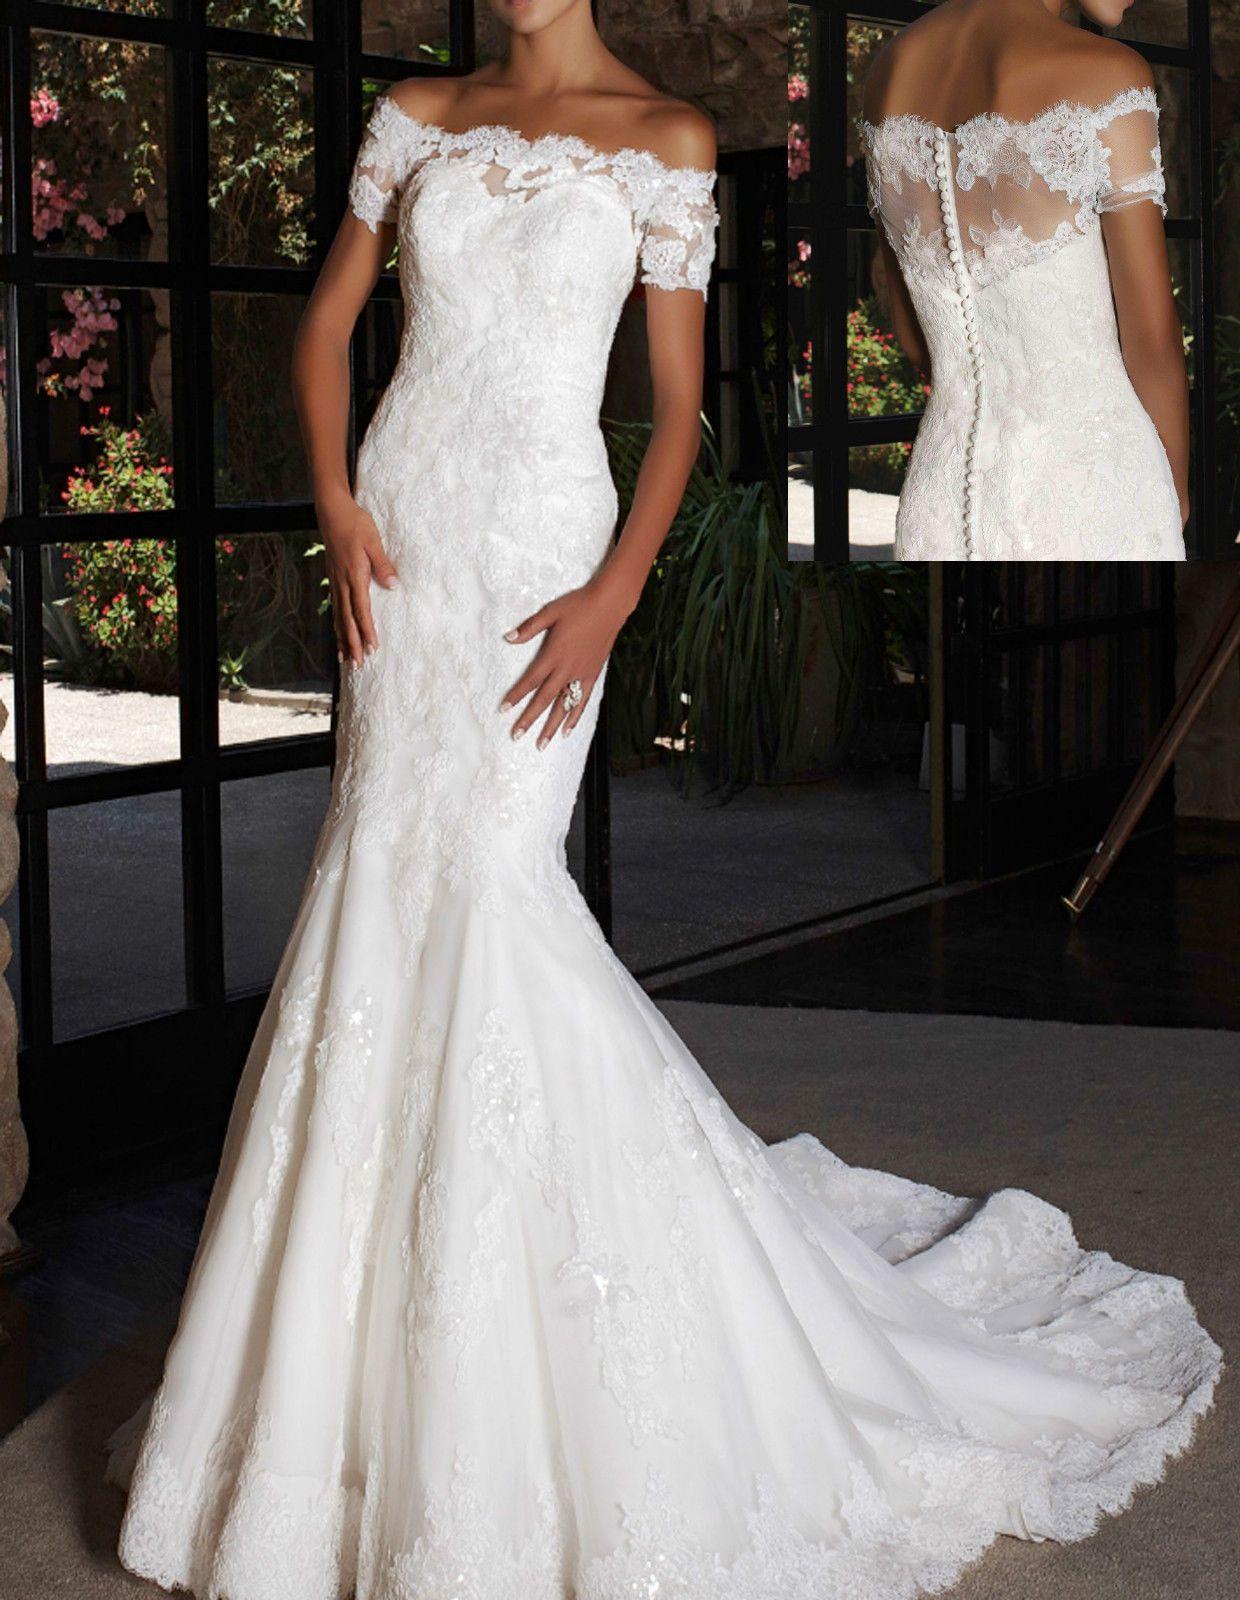 Elegant offtheshoulder short sleeve mermaid wedding dresses bridal